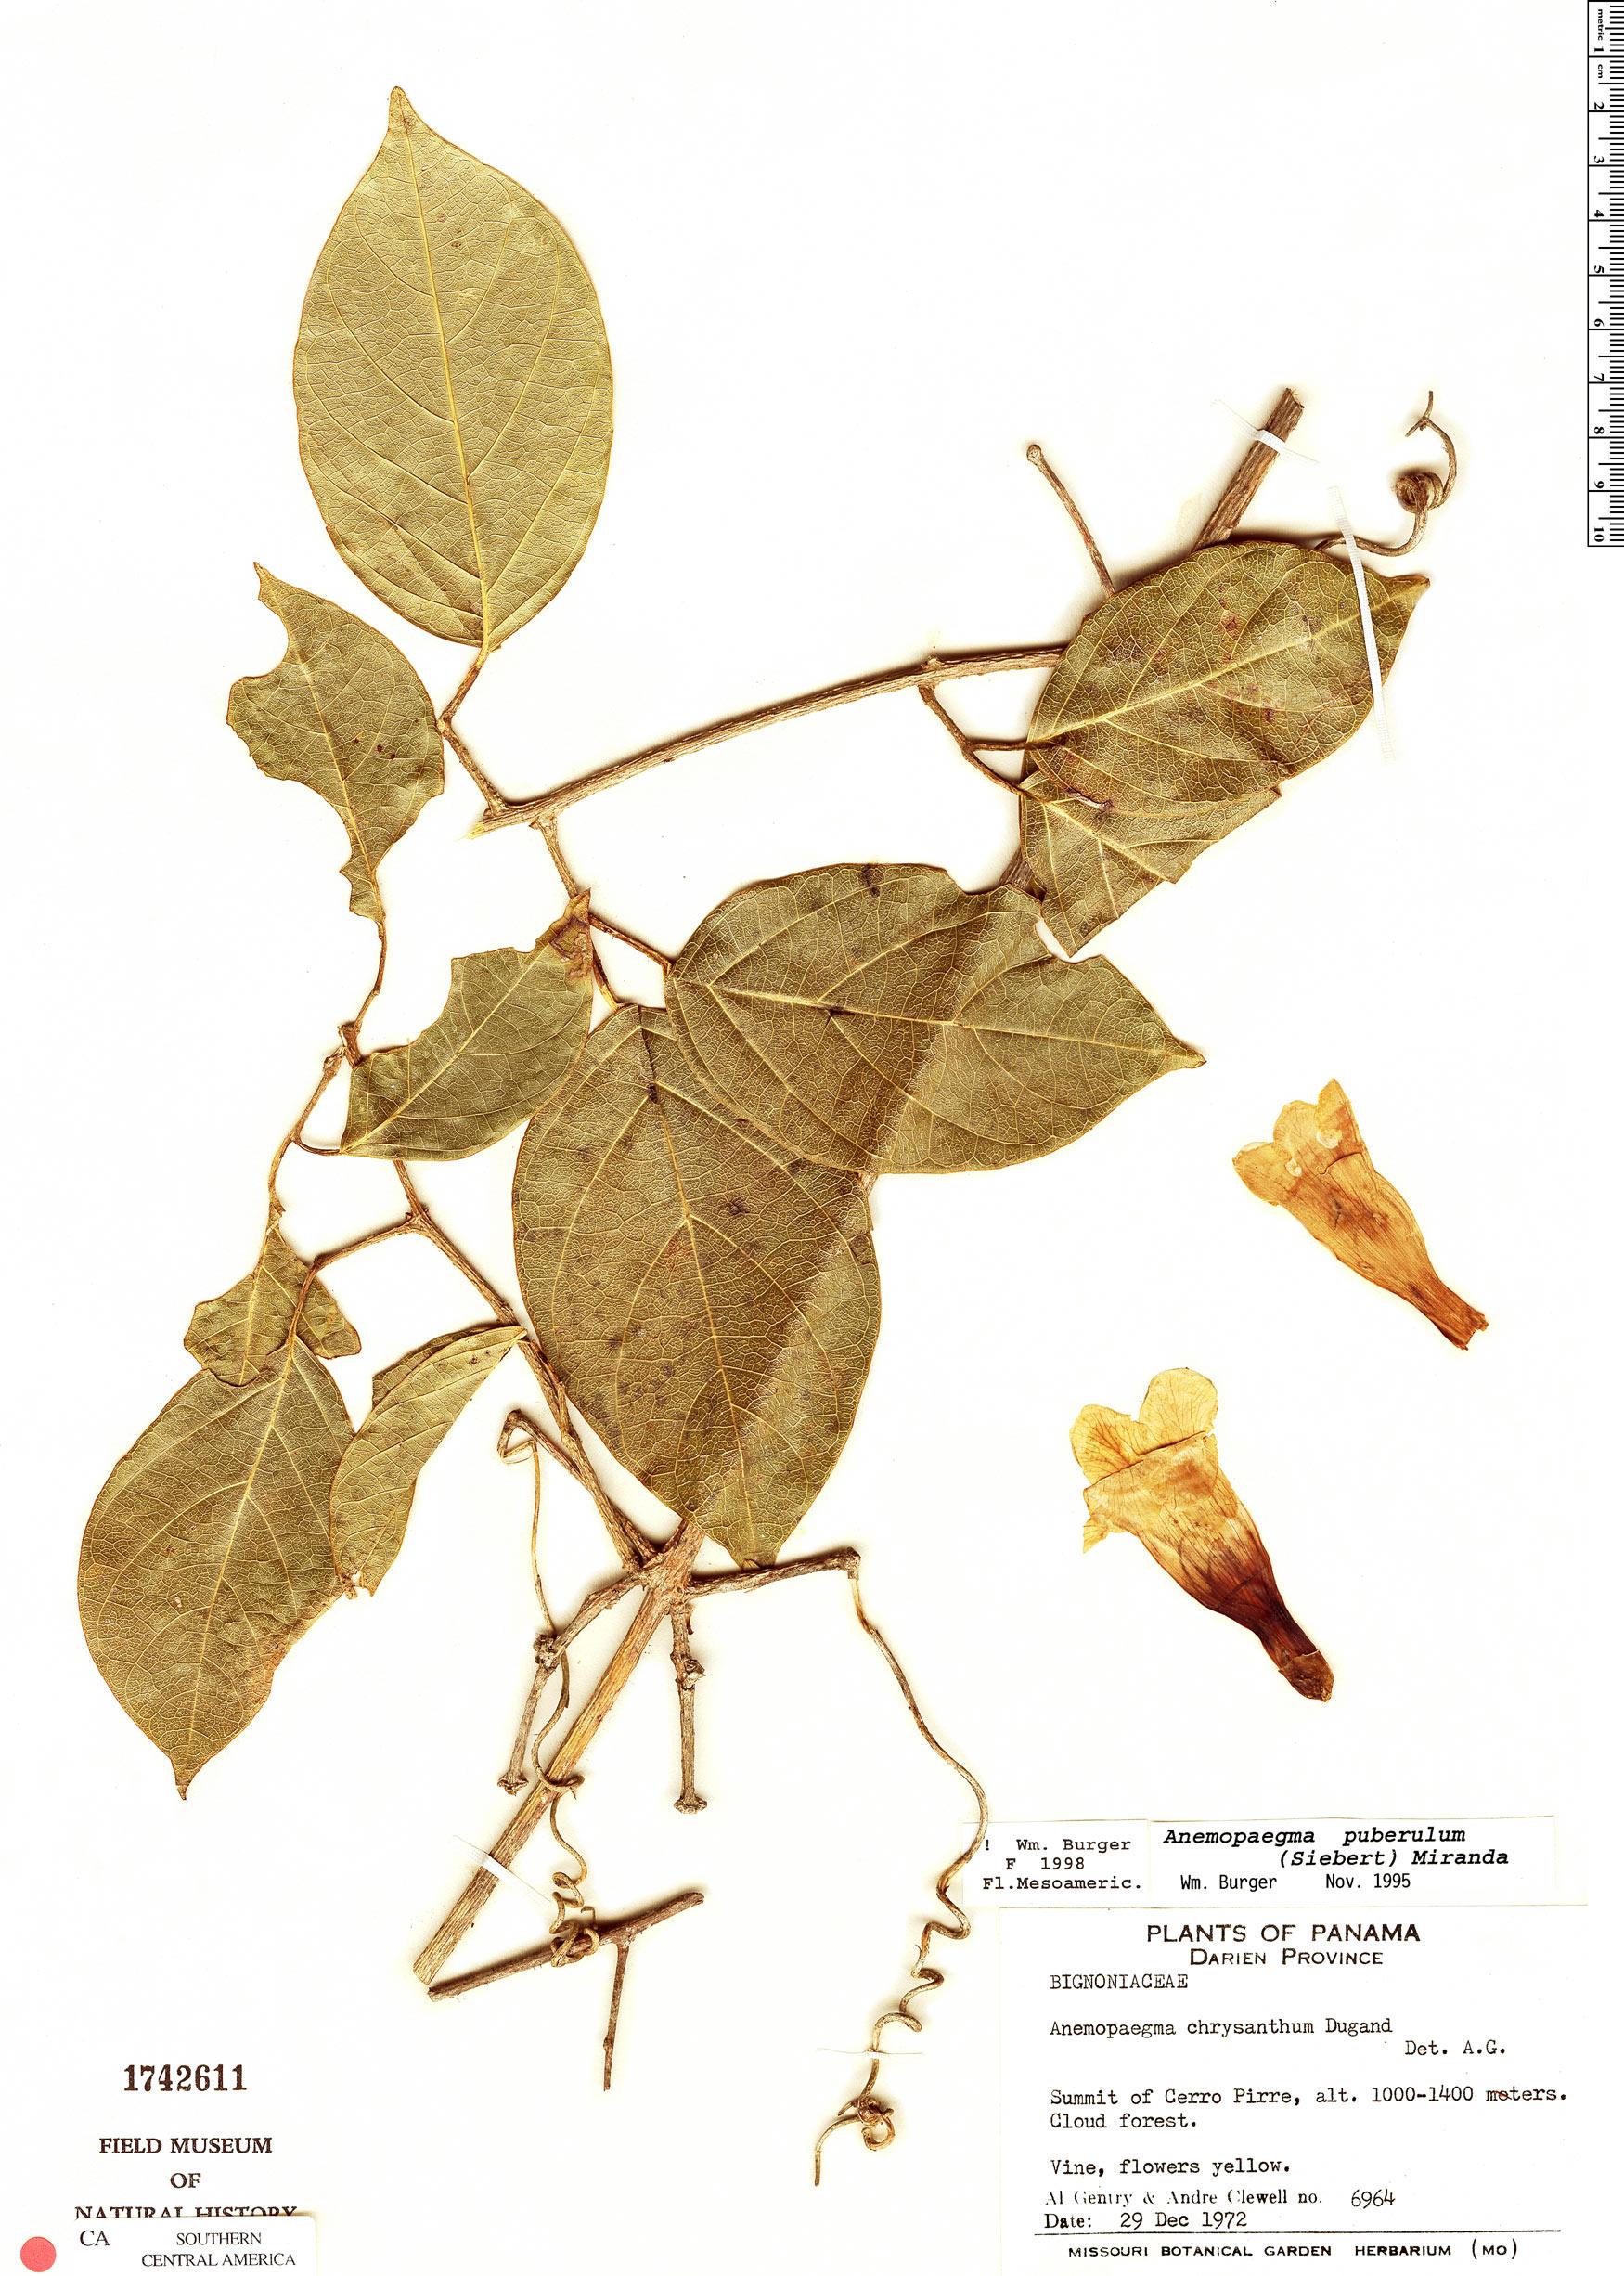 Anemopaegma puberulum image